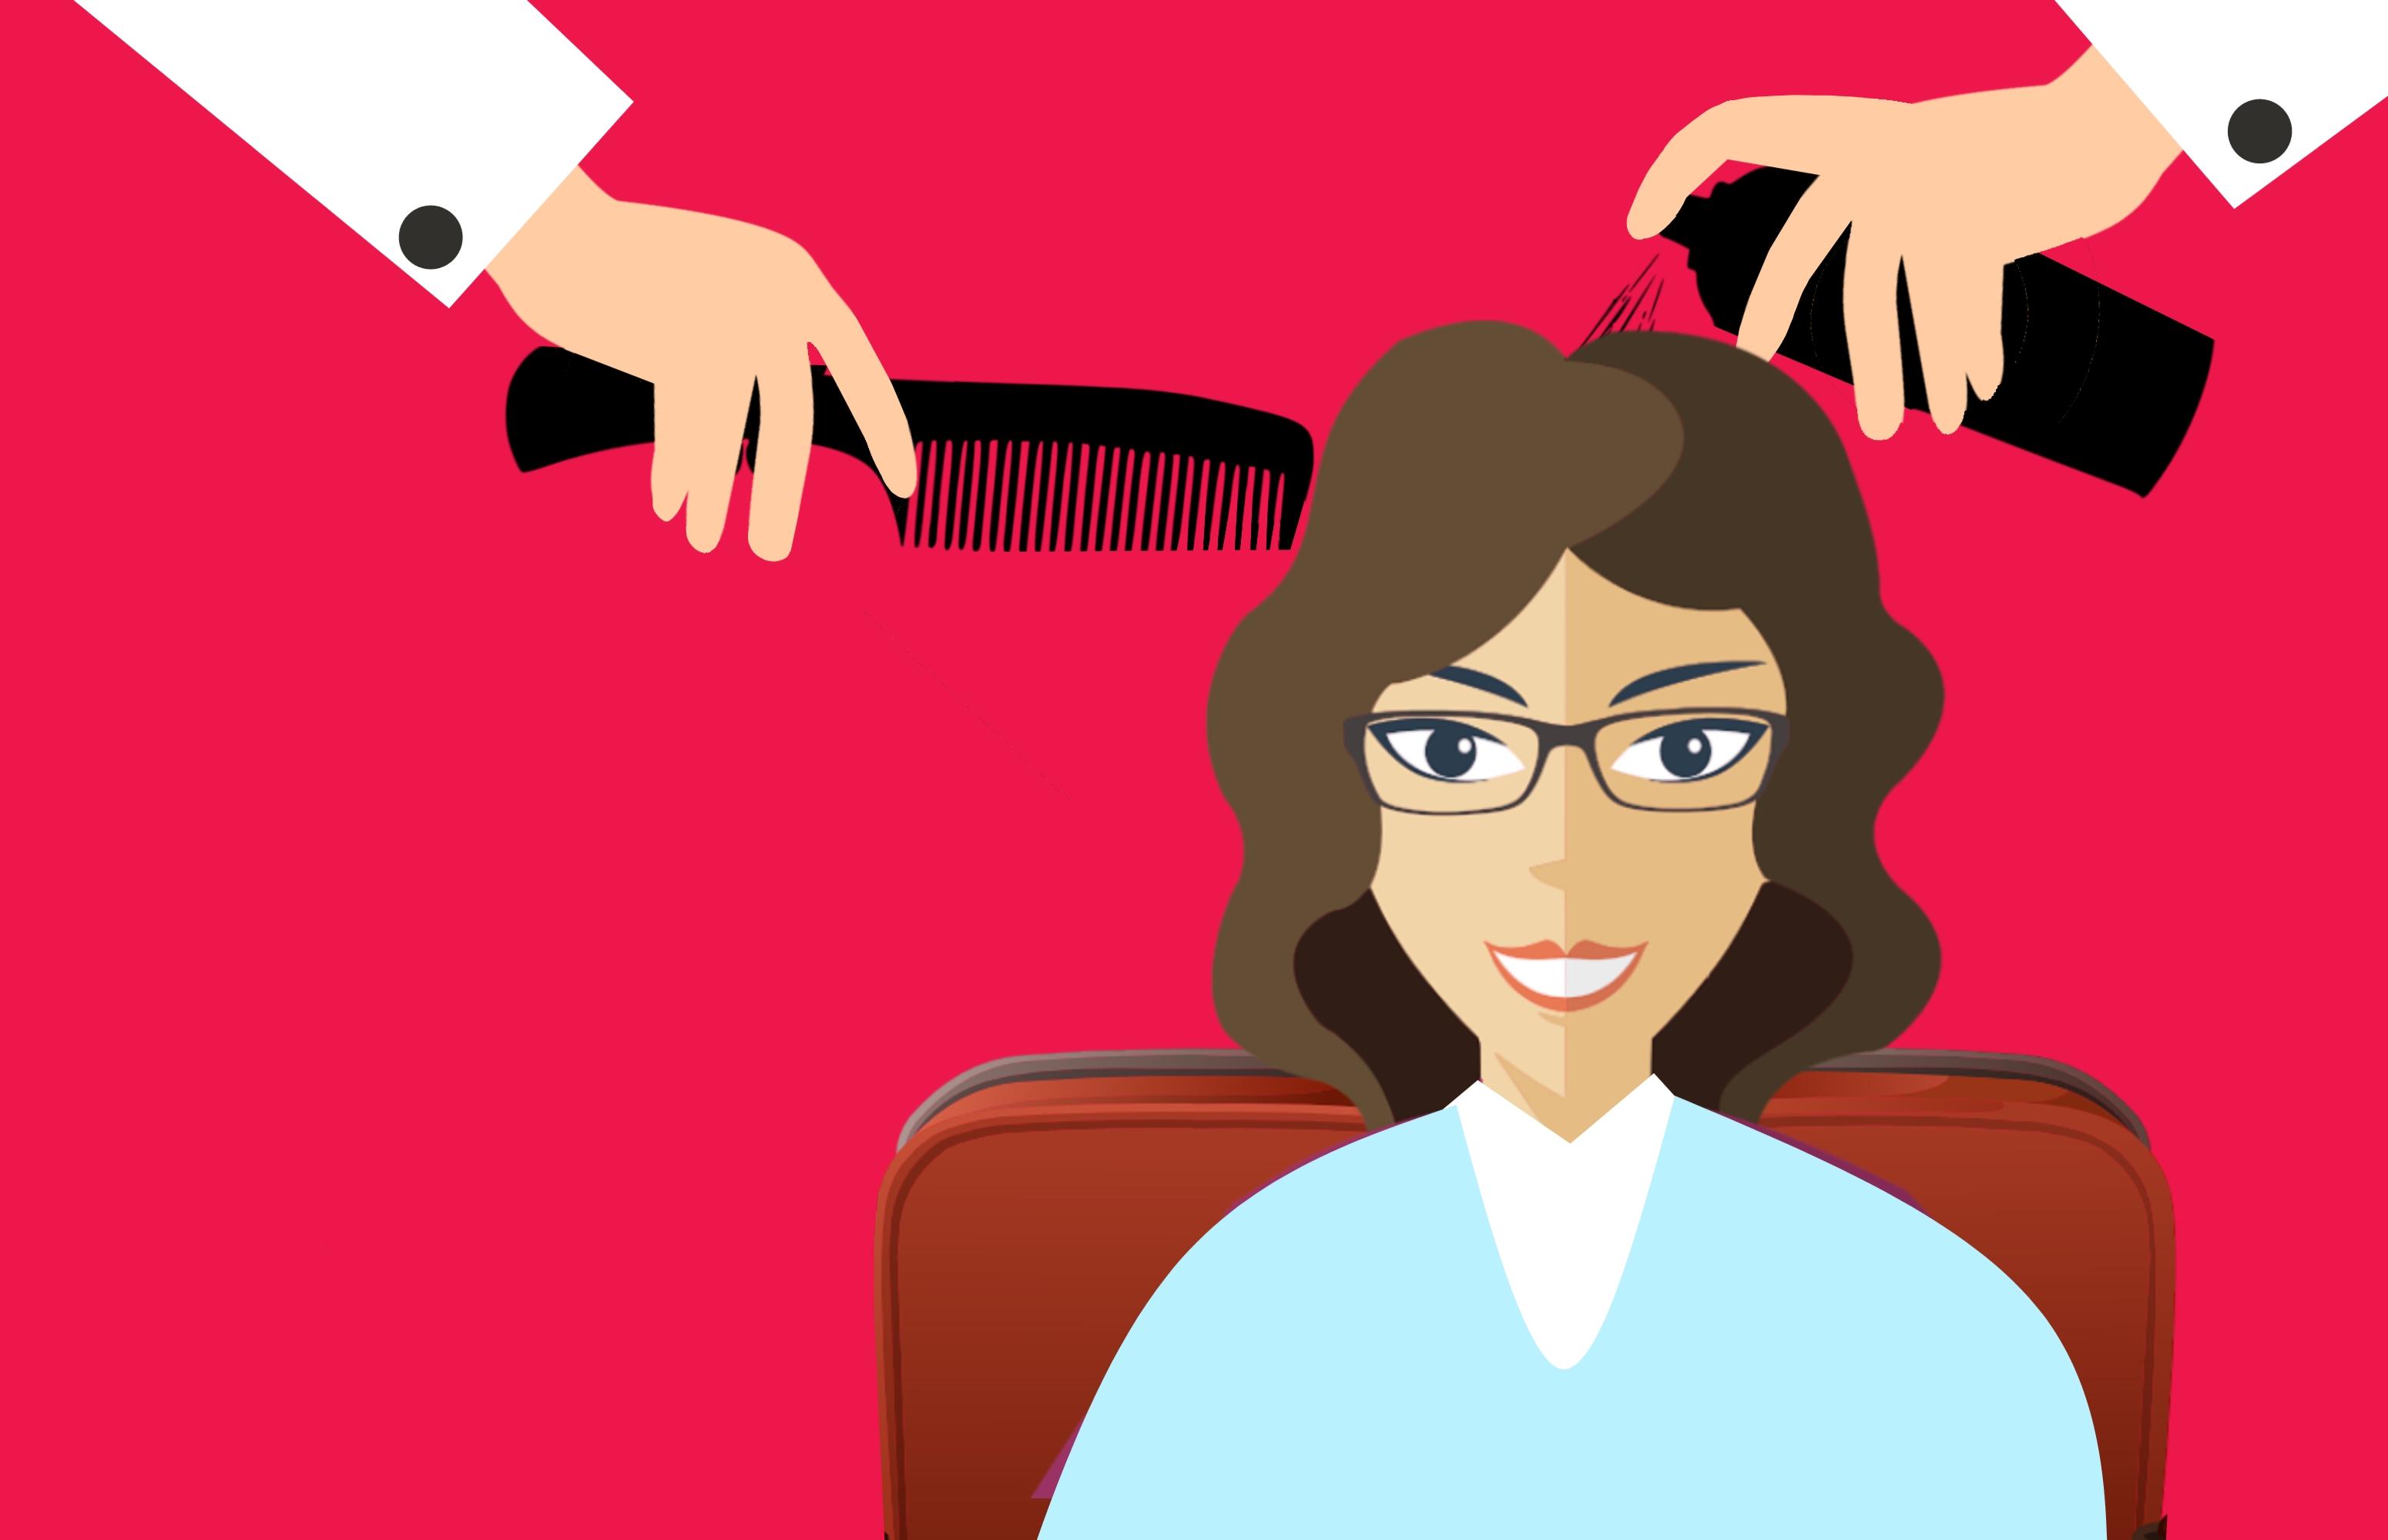 Free Images Hair Beauty Salon Hairdresser Stylist Female Fashion Modern Woman Spray Barber Chair Equipment Care Health Style Beautiful Trim Hairdo Cosmetics Shampoo Service Hairstyle Fashionable Animated Cartoon Illustration